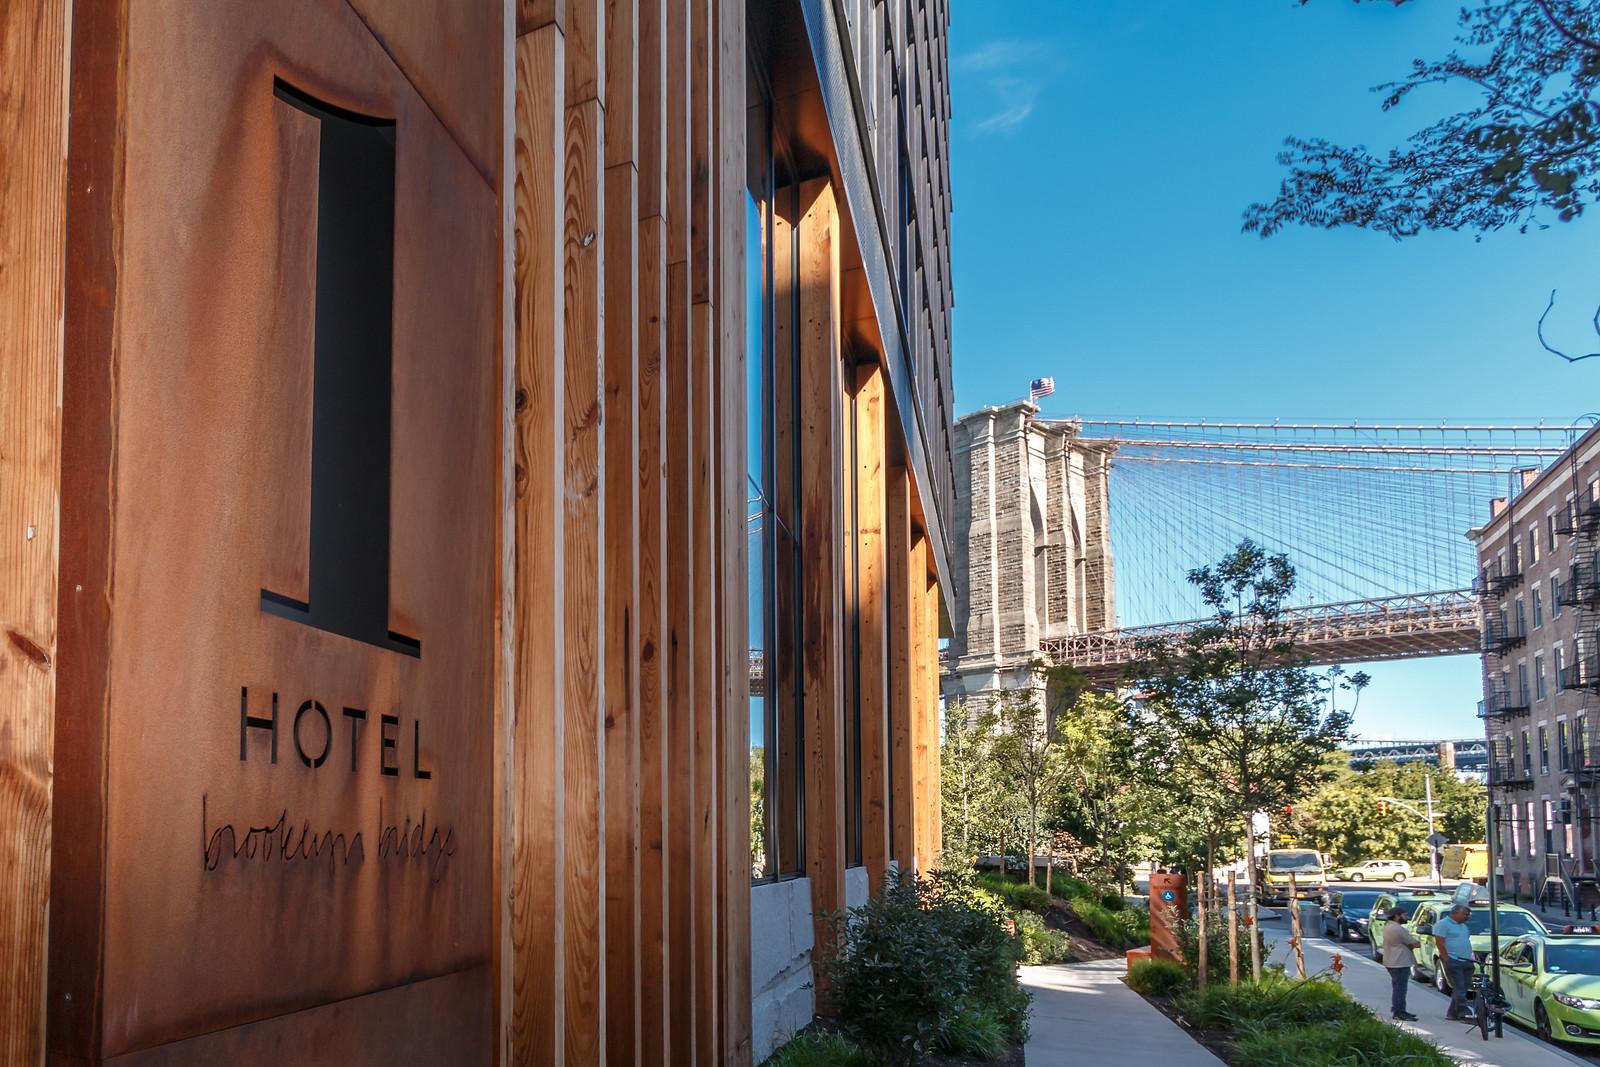 1 Hotel Brooklyn Bridge kellyelko.com